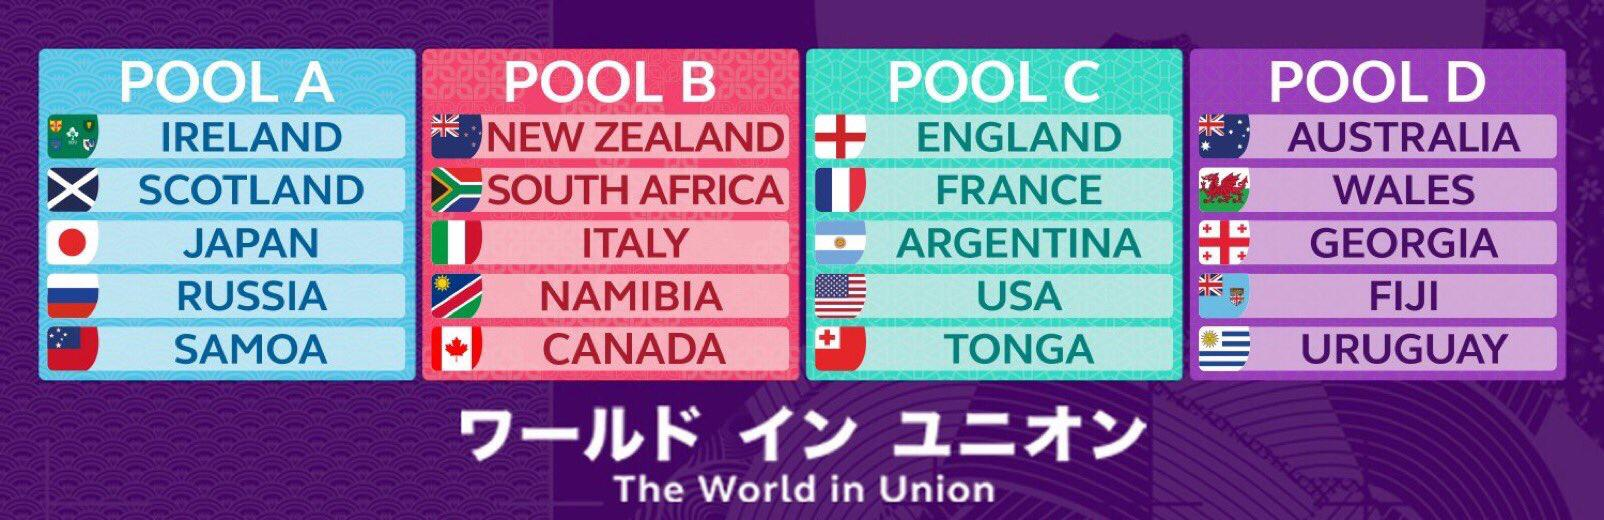 Pools RWC2019